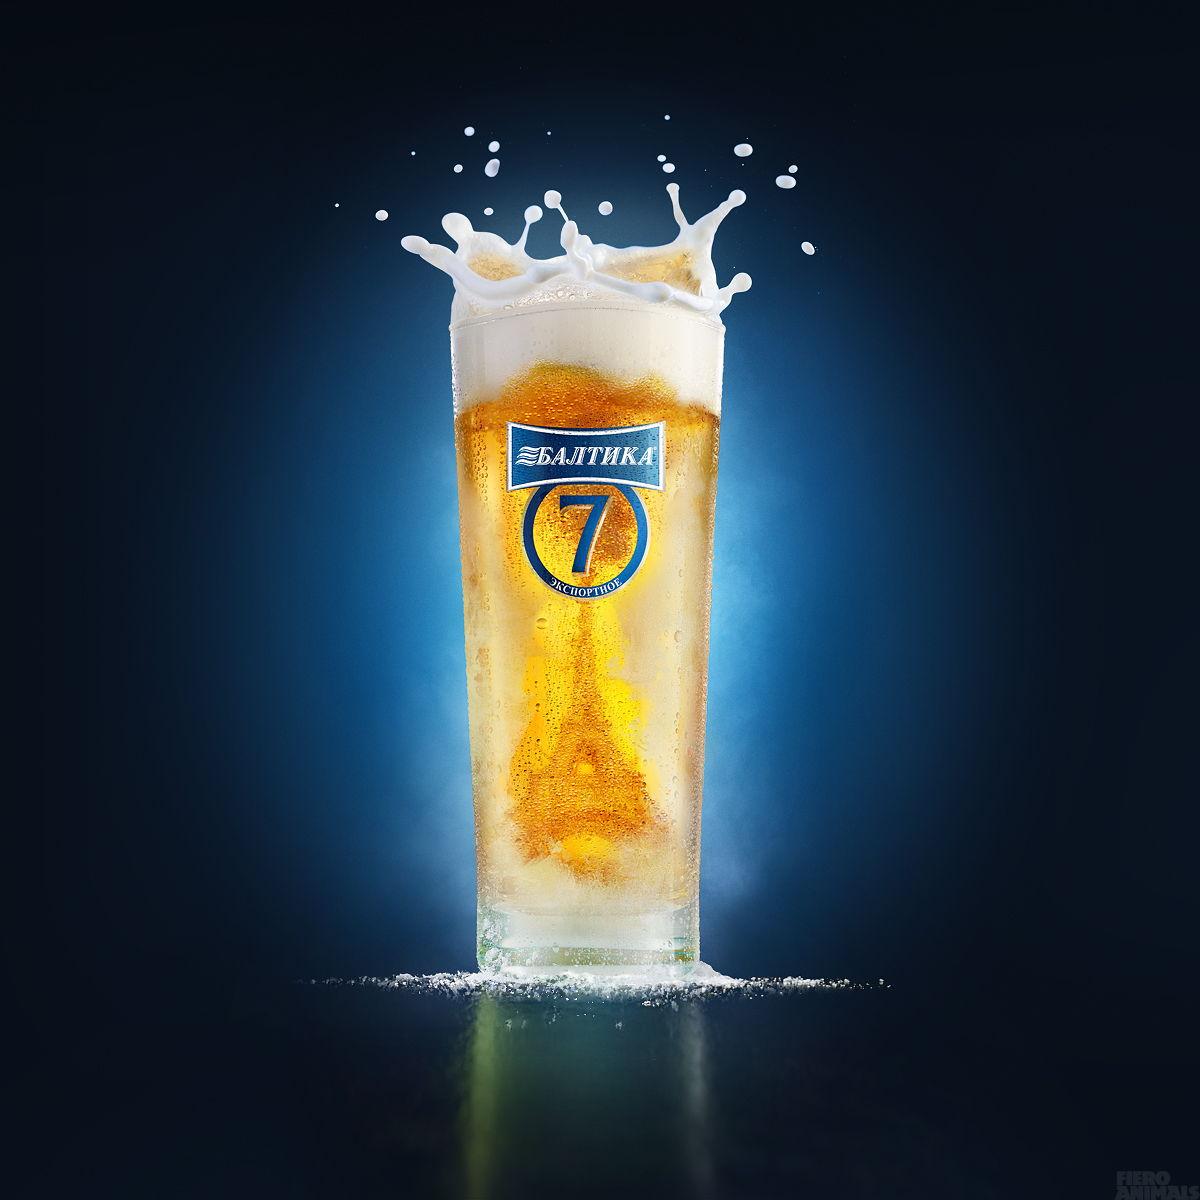 пиво Балтика производитель, пиво Балтика цена, пиво Балтика 3 крепость, пиво Балтика 7 крепость, пиво Балтика разливное непастеризованное, пиво Балтика отзывы